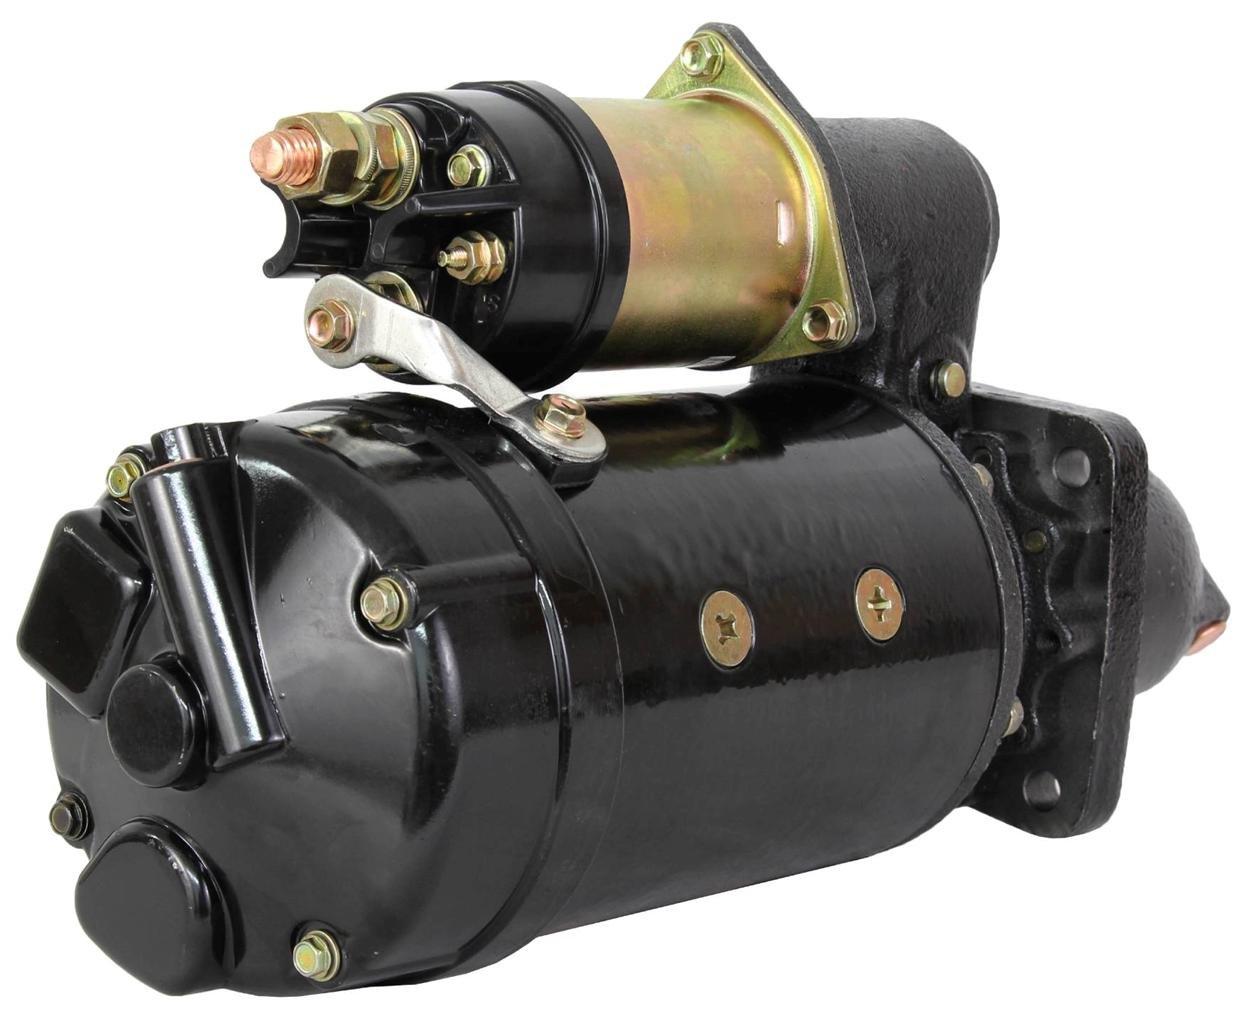 Amazon.com: NEW STARTER MOTOR FITS JOHN DEERE TRACTOR 3020 4000 4020 4030  4230 4430 4520 AR62267: Automotive